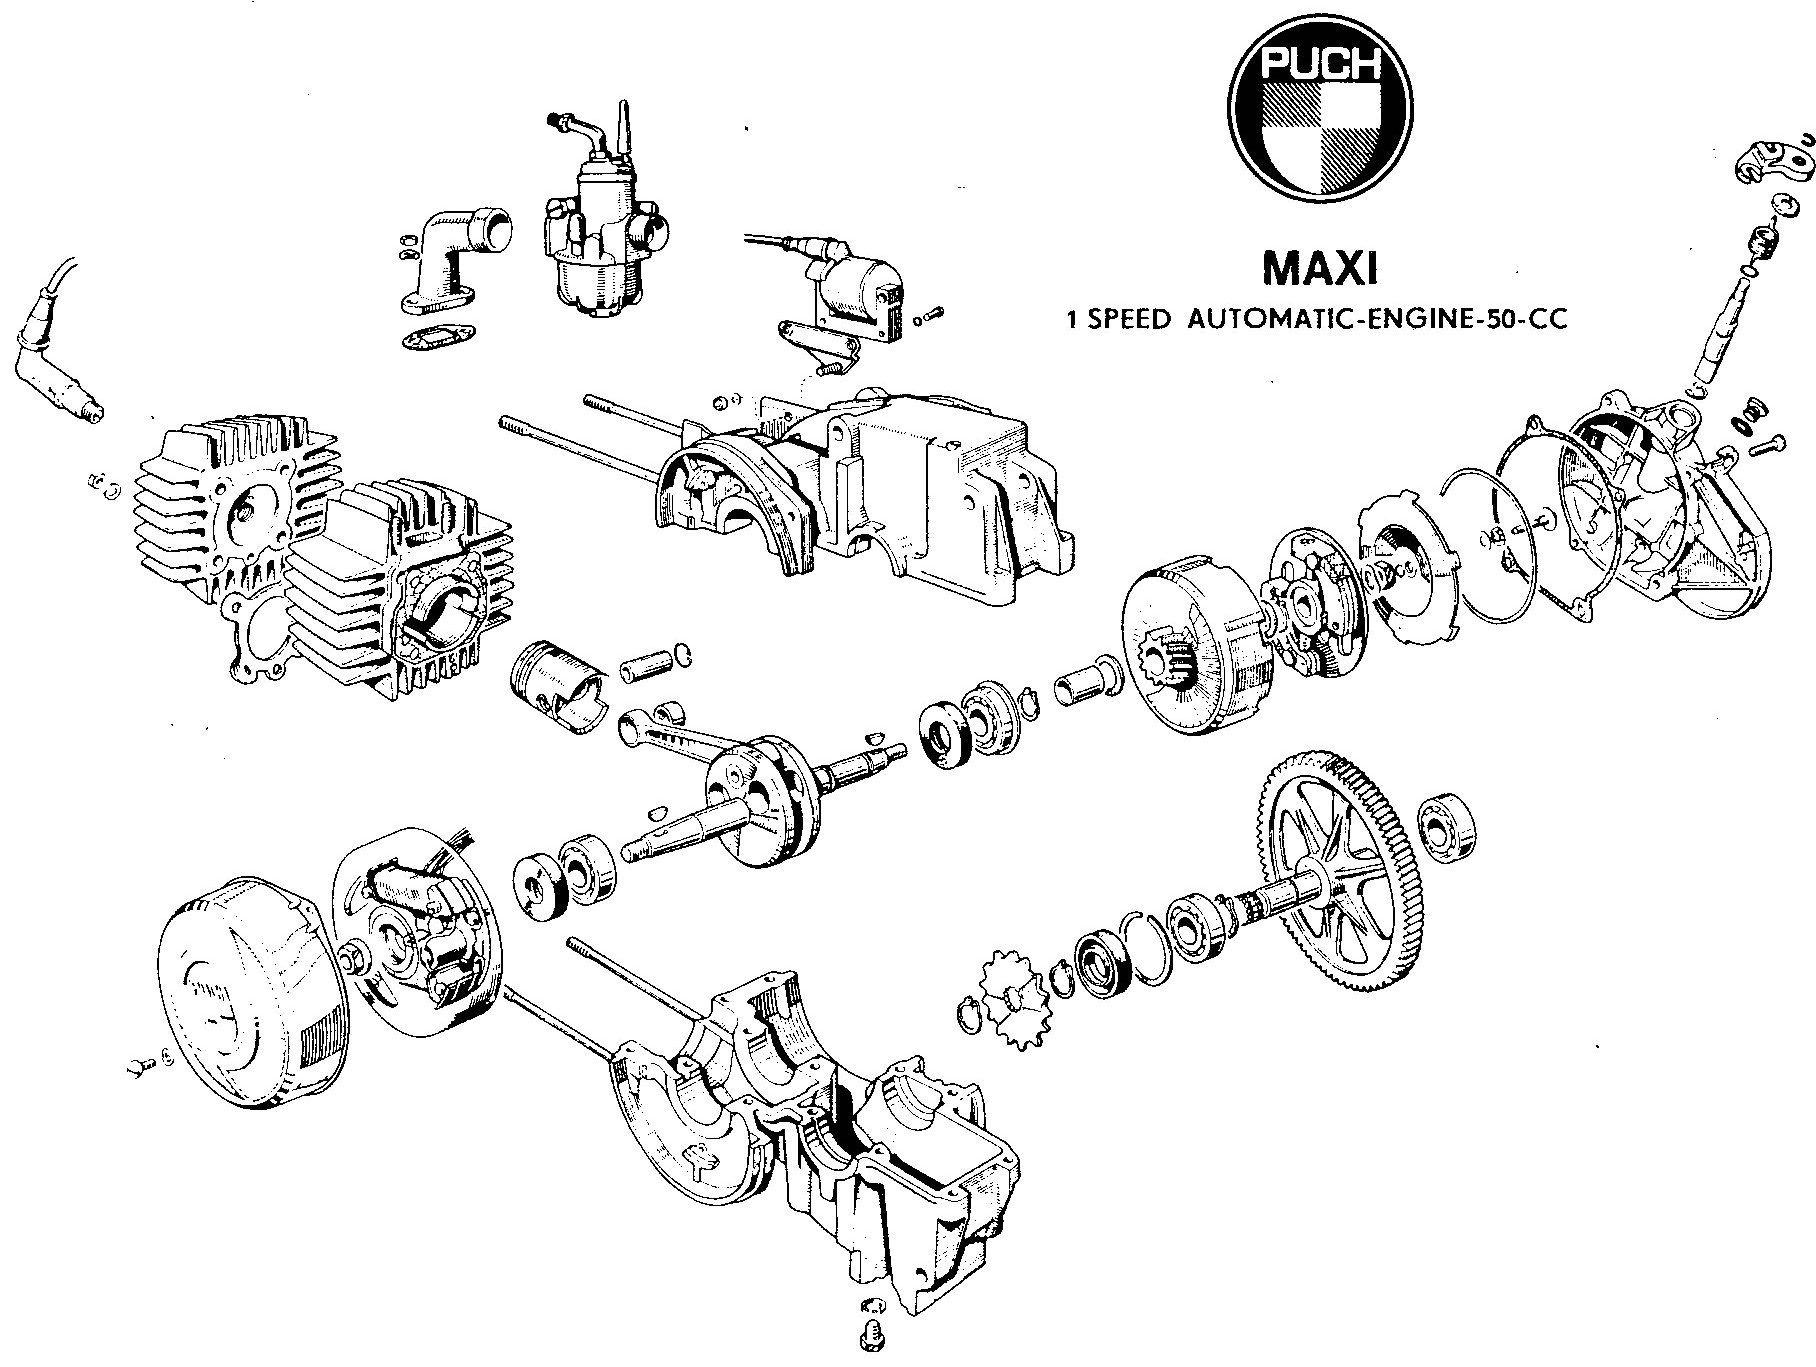 hight resolution of handy diagram of the e50 puch engine mopeds u2022 lil chopz bultaco engine tomos a35 engine diagram